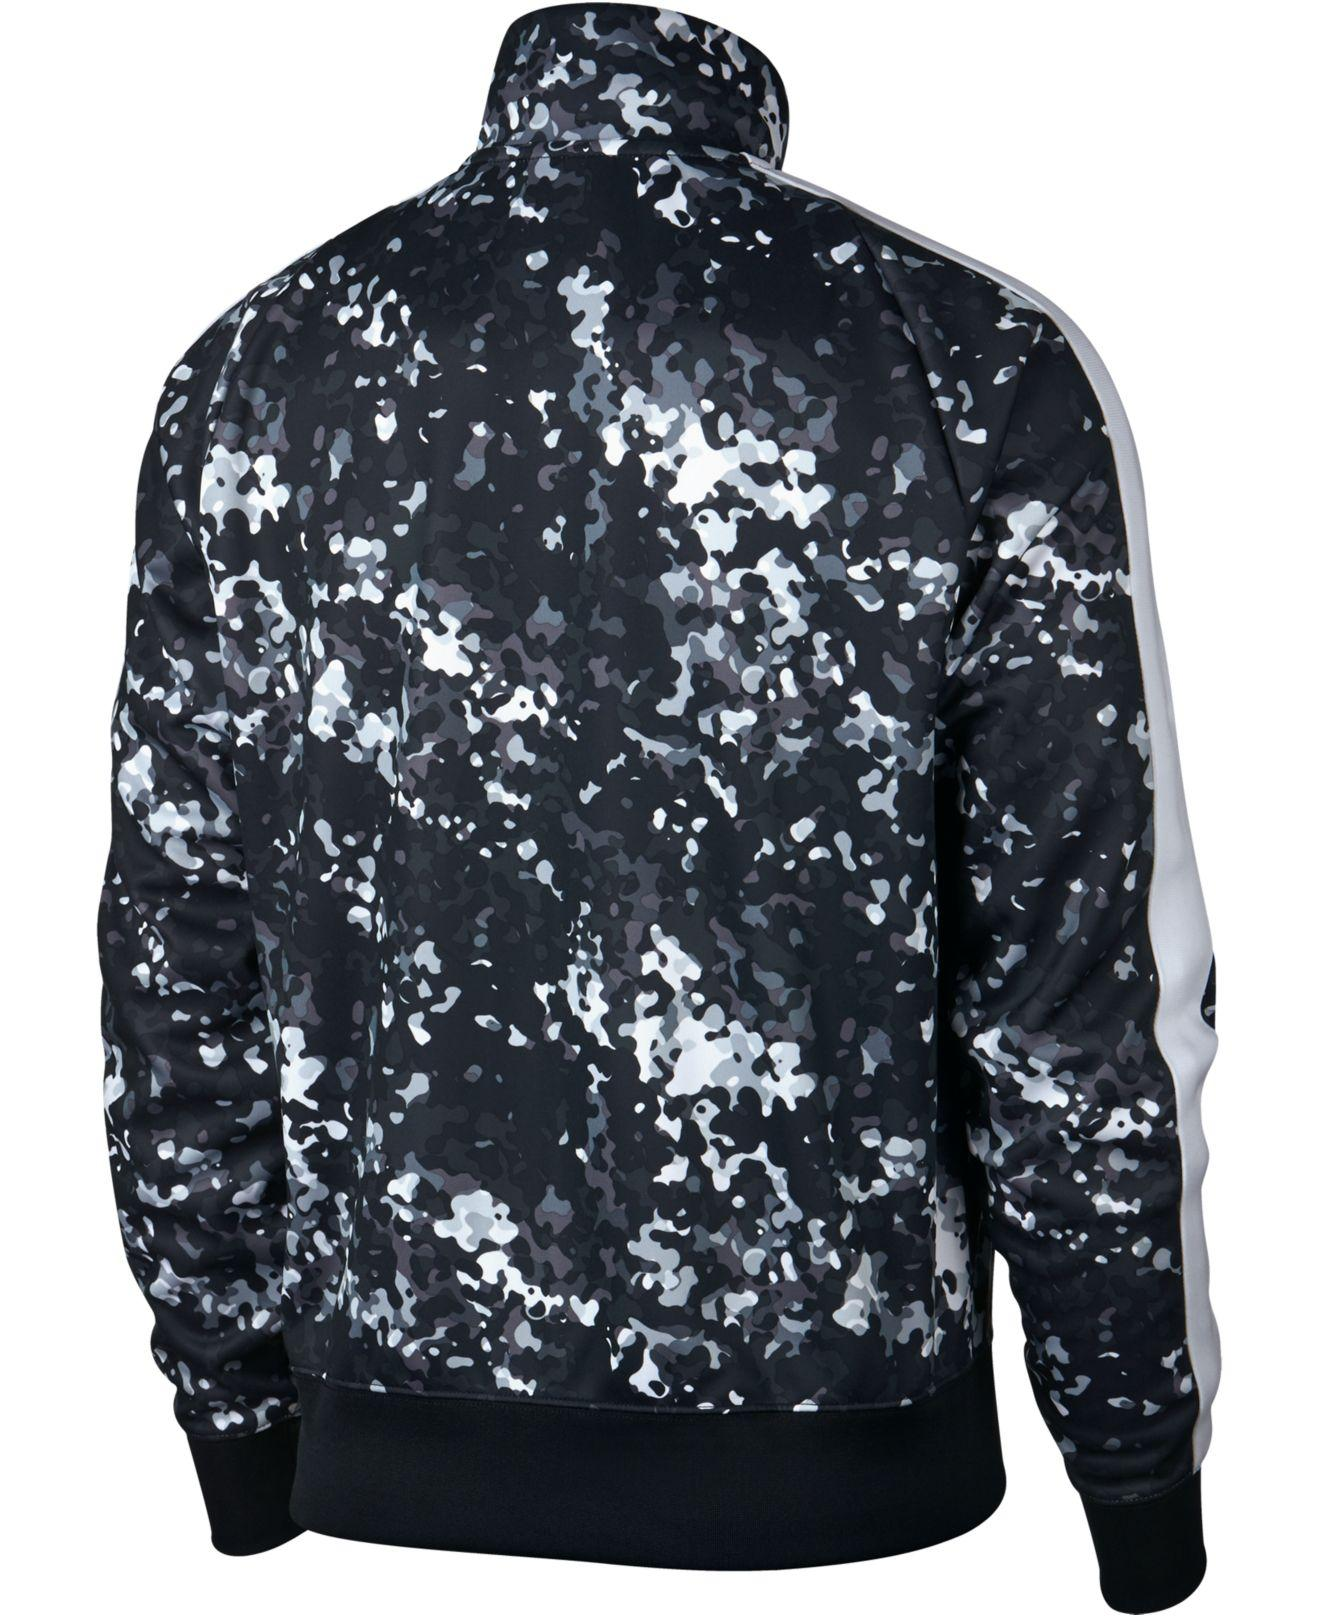 Lyst - Nike Sportswear Printed Track Jacket in Black for Men 28b2bafd7